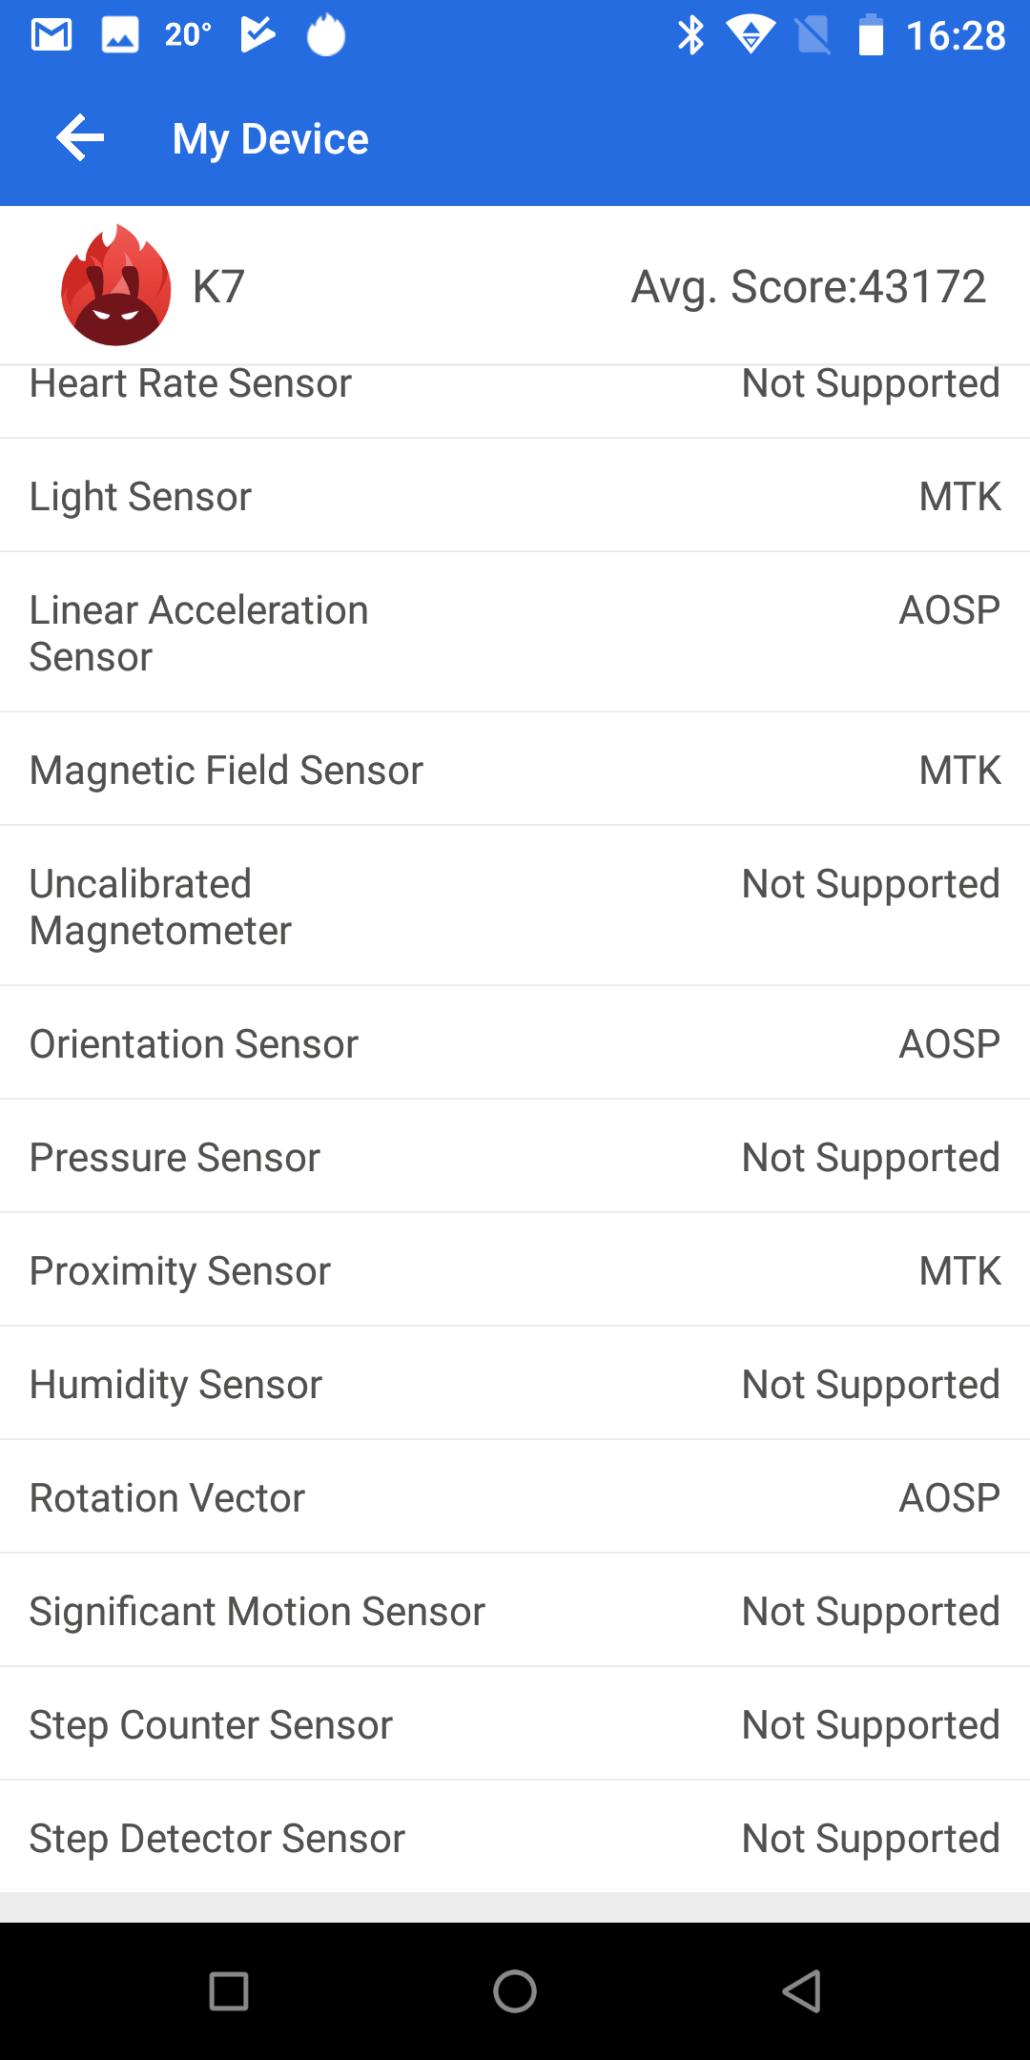 oukitel-k7-phone-review-05-part-9-antutu-sensors-part-2